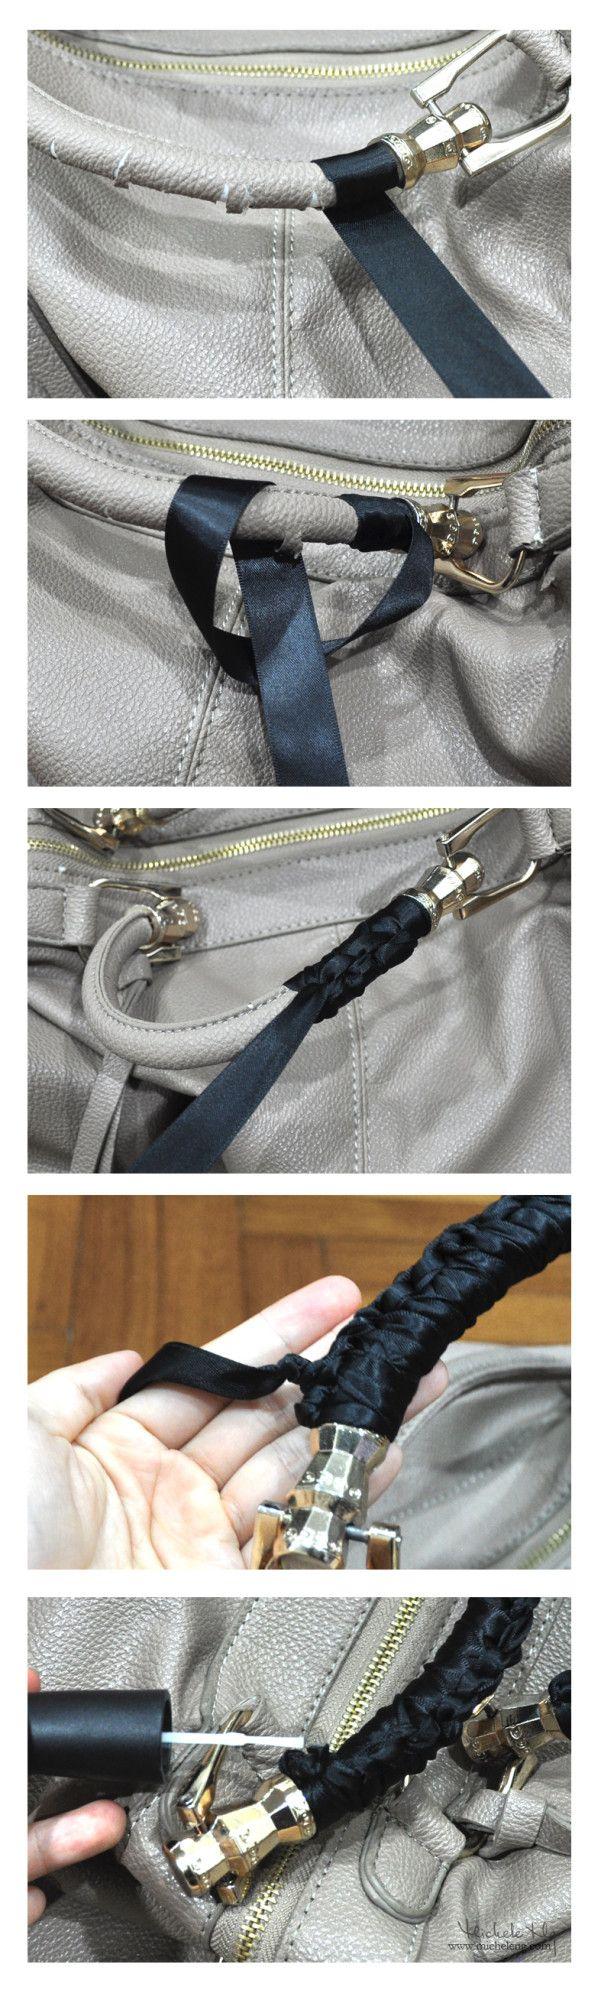 Sauver les anses d'un sac avec un ruban noué...